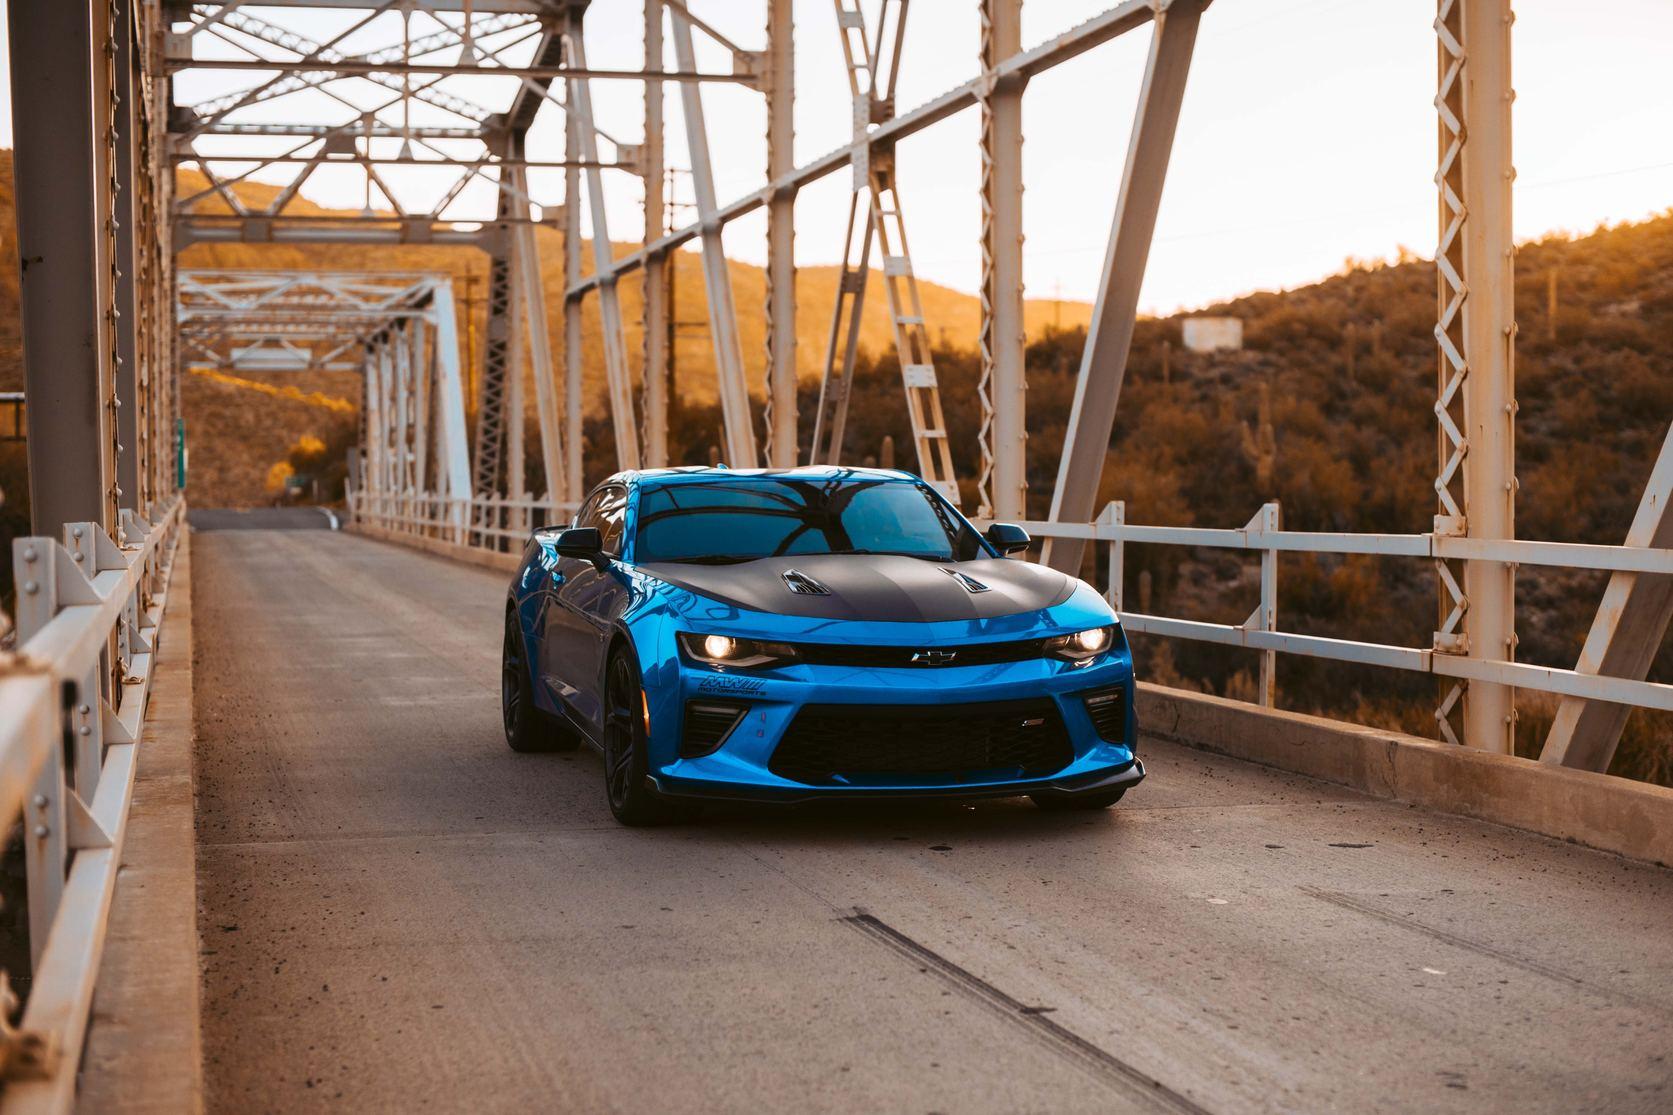 Common Repairs for Chevrolet